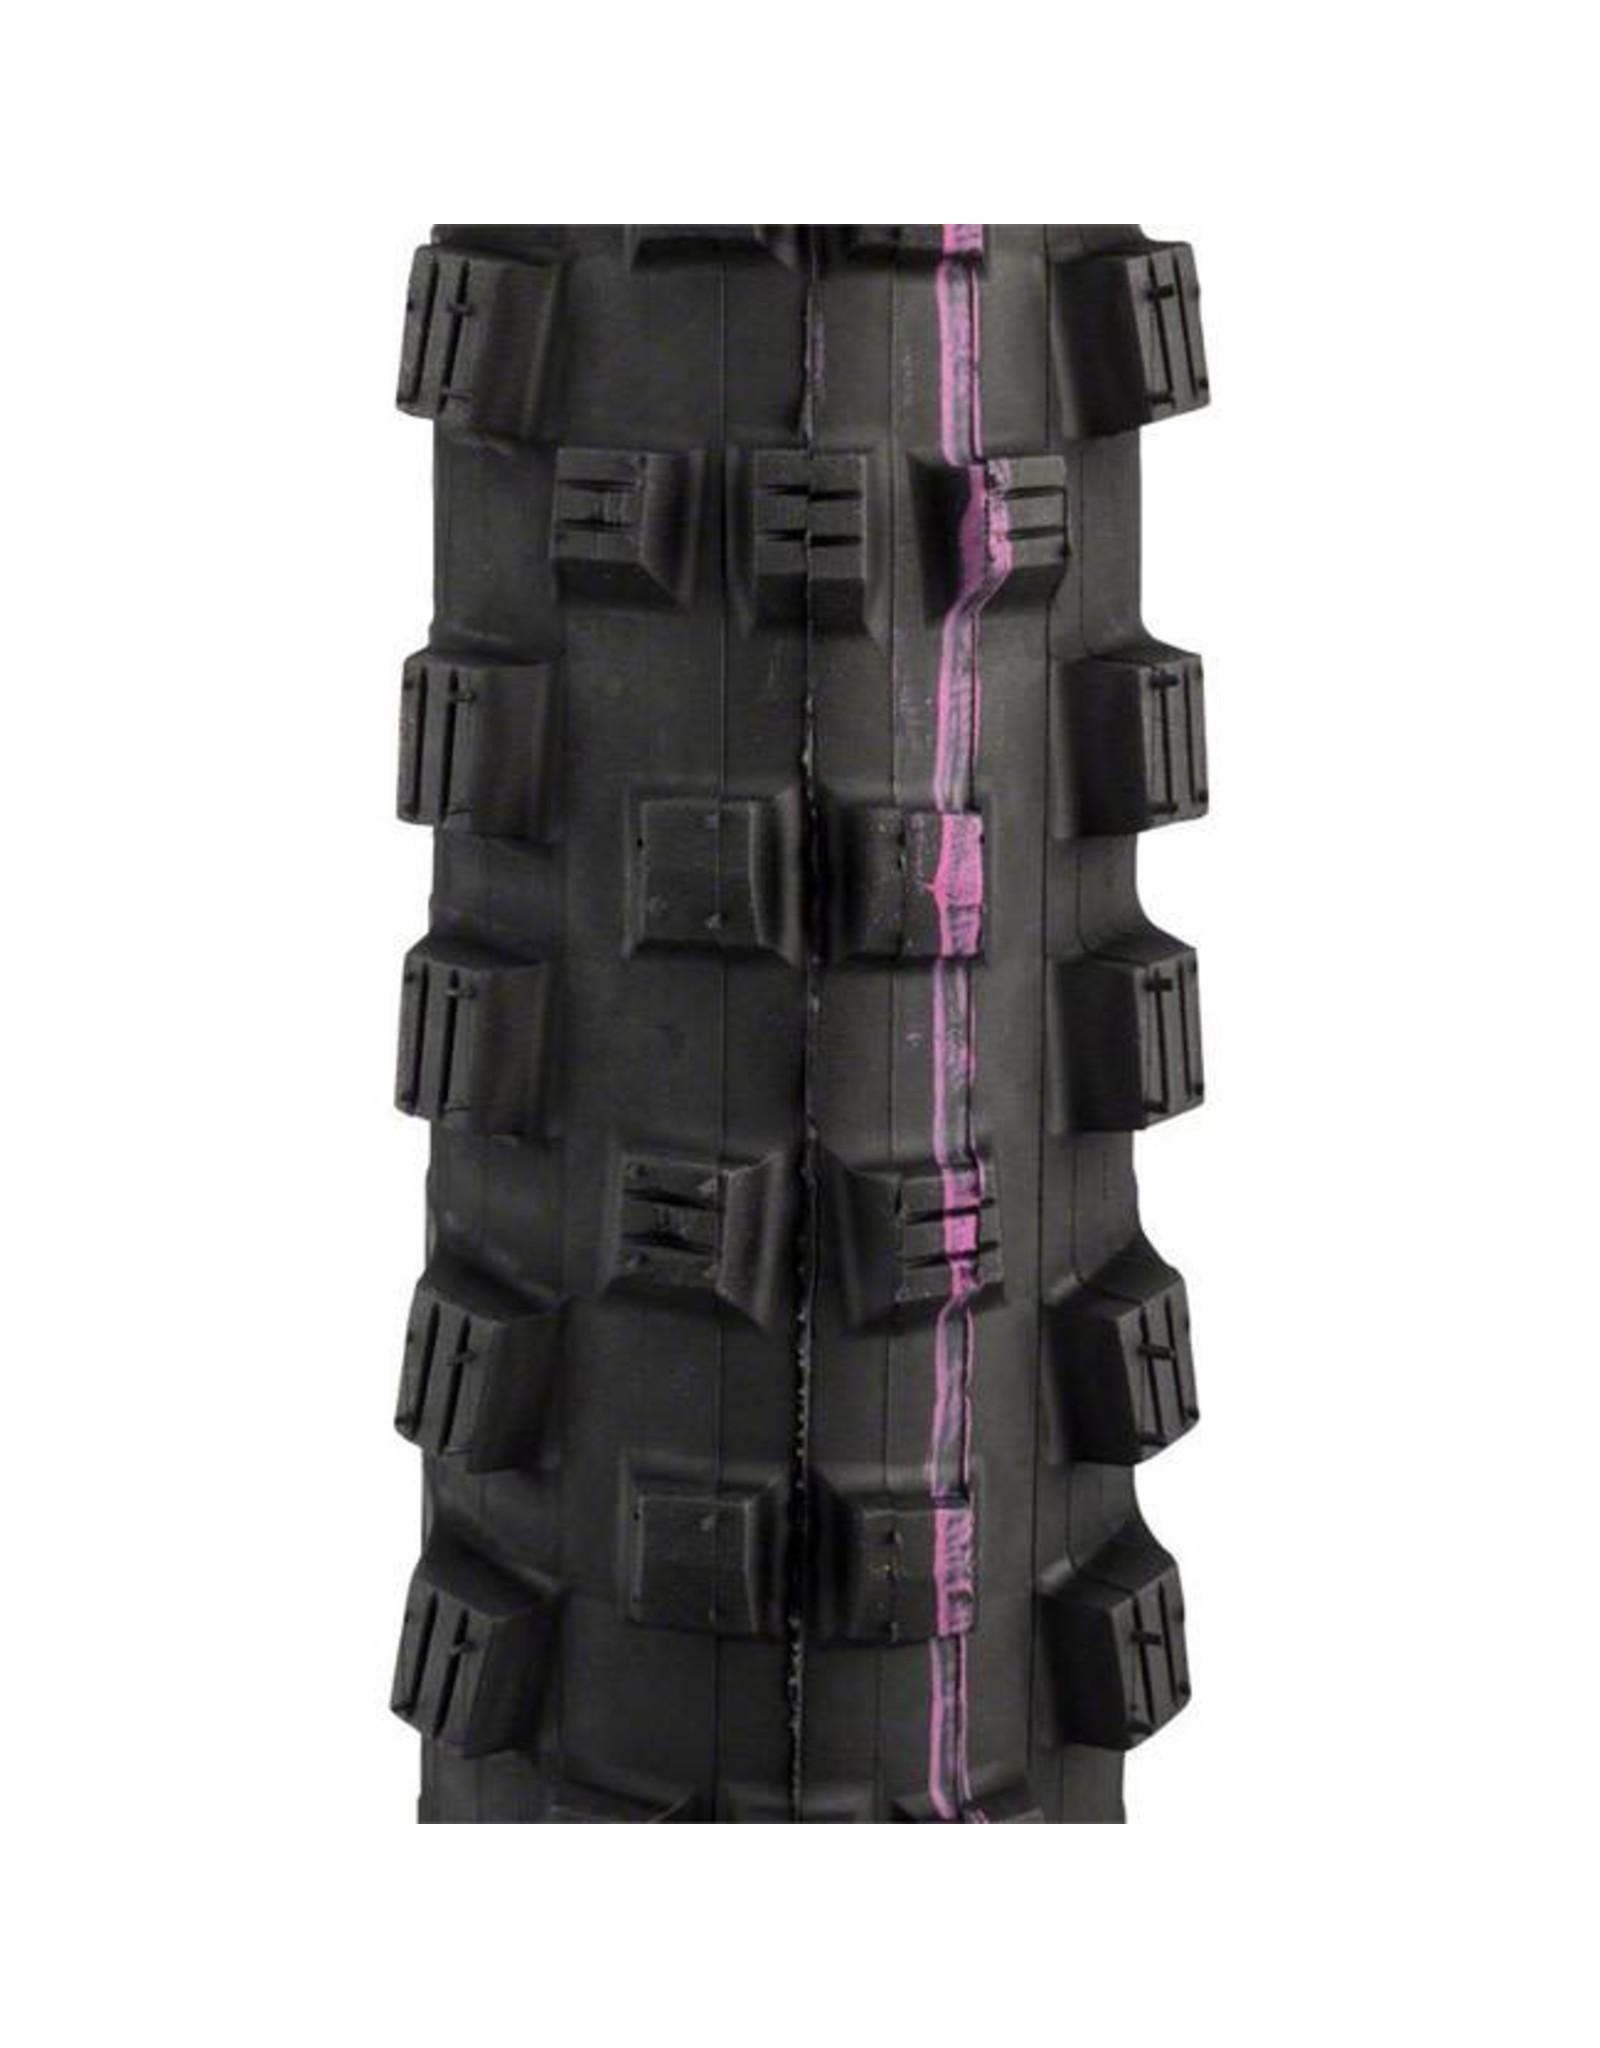 "Schwalbe Schwalbe Magic Mary Tire: 27.5 x 2.35"", Wire Bead, Performance Line, Addix Performance Compound, BikePark, Black"